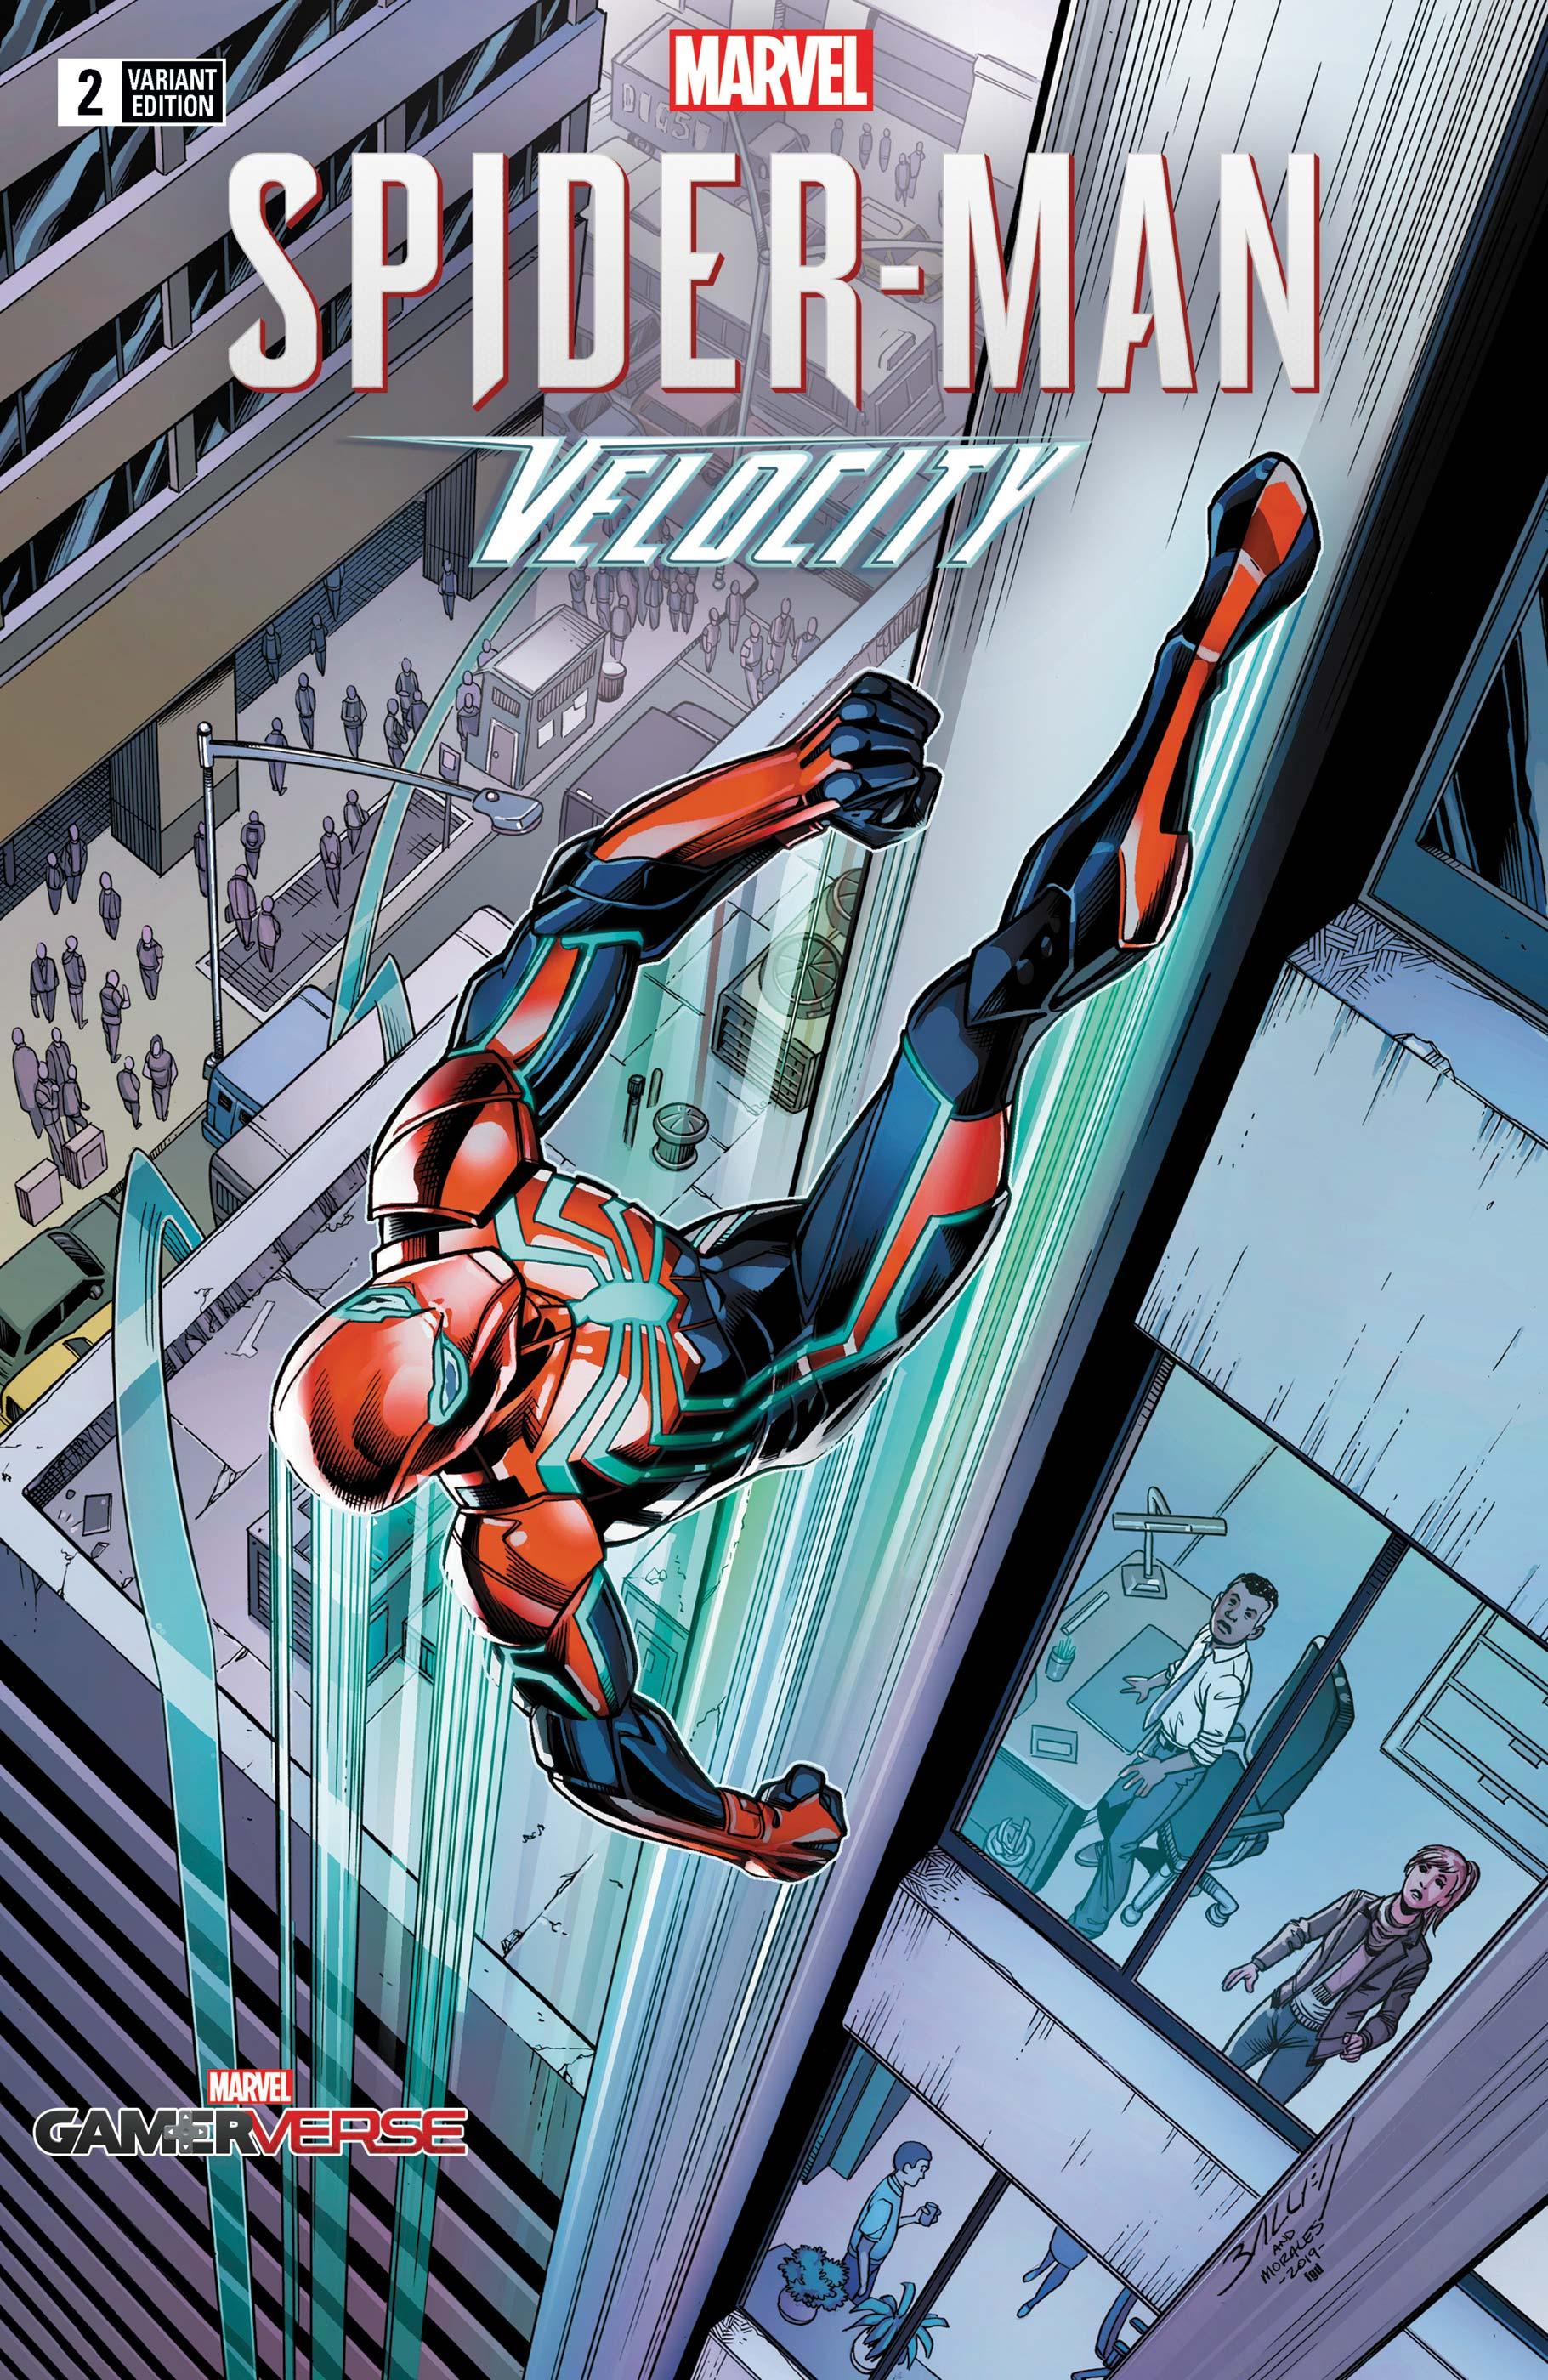 Marvel's Spider-Man: Velocity (2019) #2 (Variant)